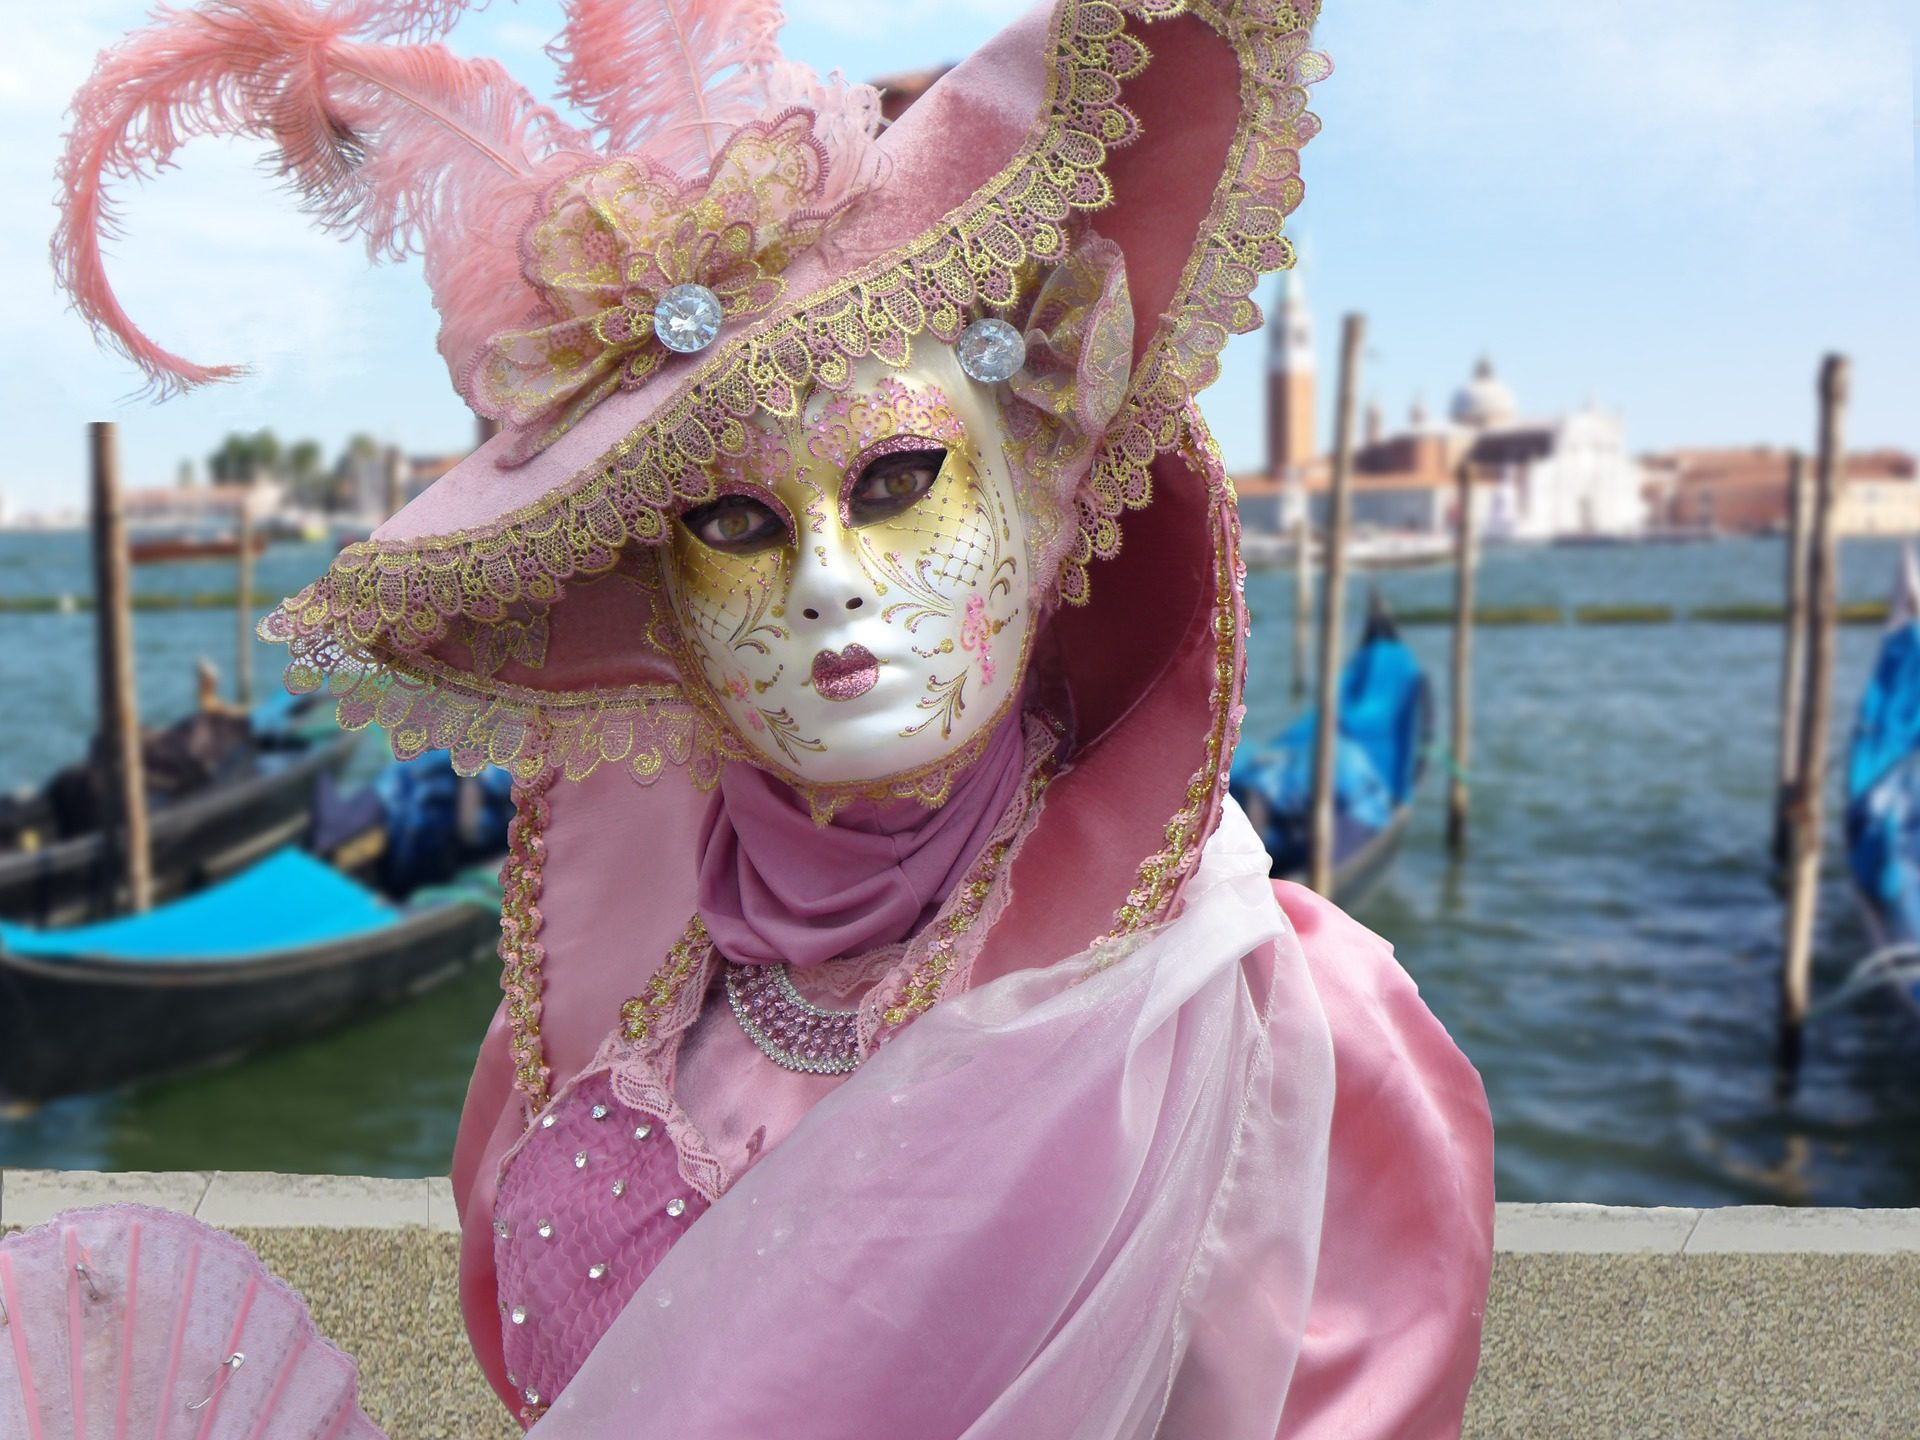 máscara, disfraz, carnaval, venecia, italia - Fondos de Pantalla HD - professor-falken.com